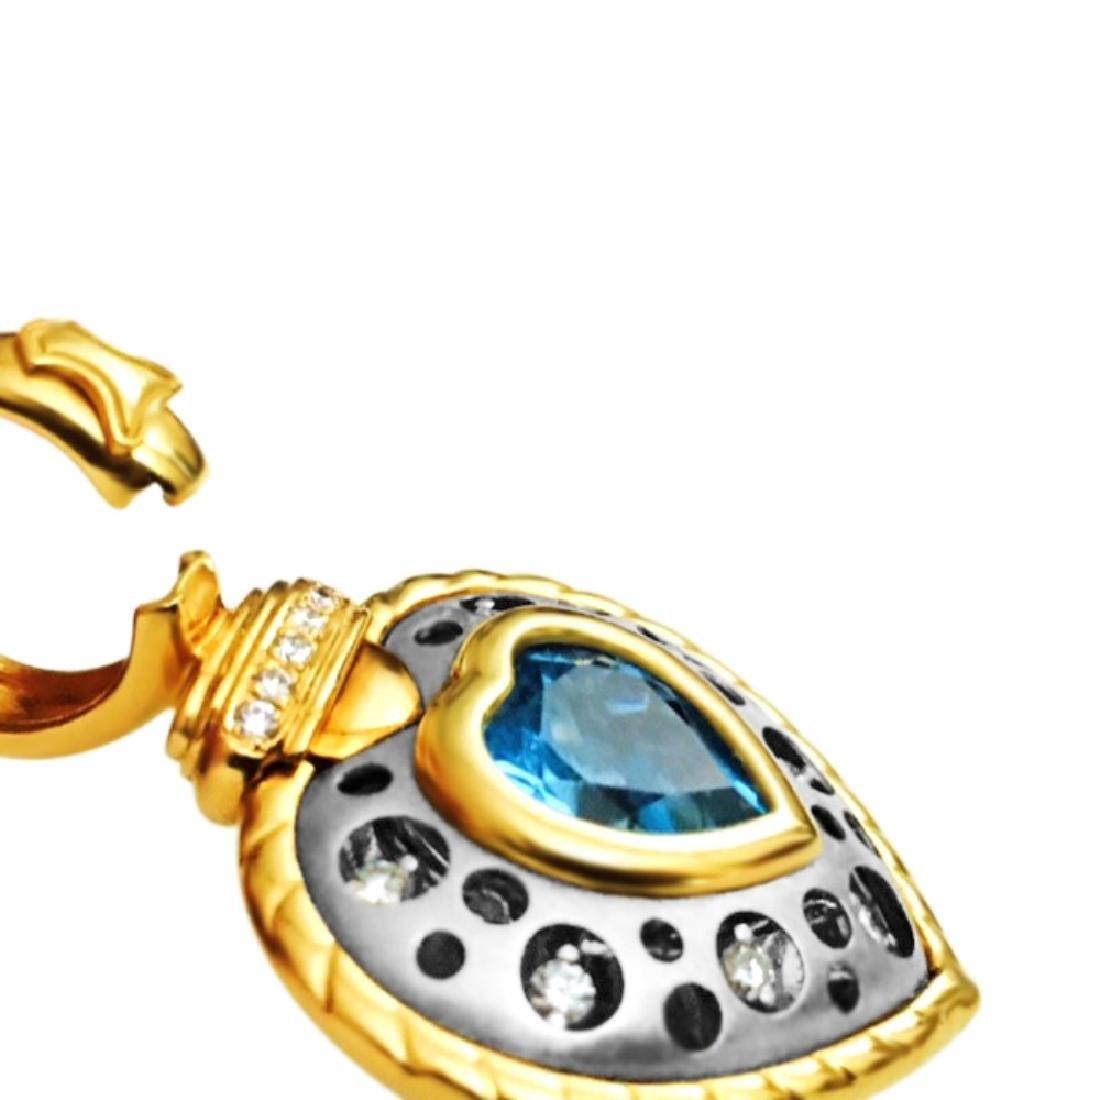 18k Gold Natasha C Diamond Pendant VVS CLARITY DIAMONDS - 4